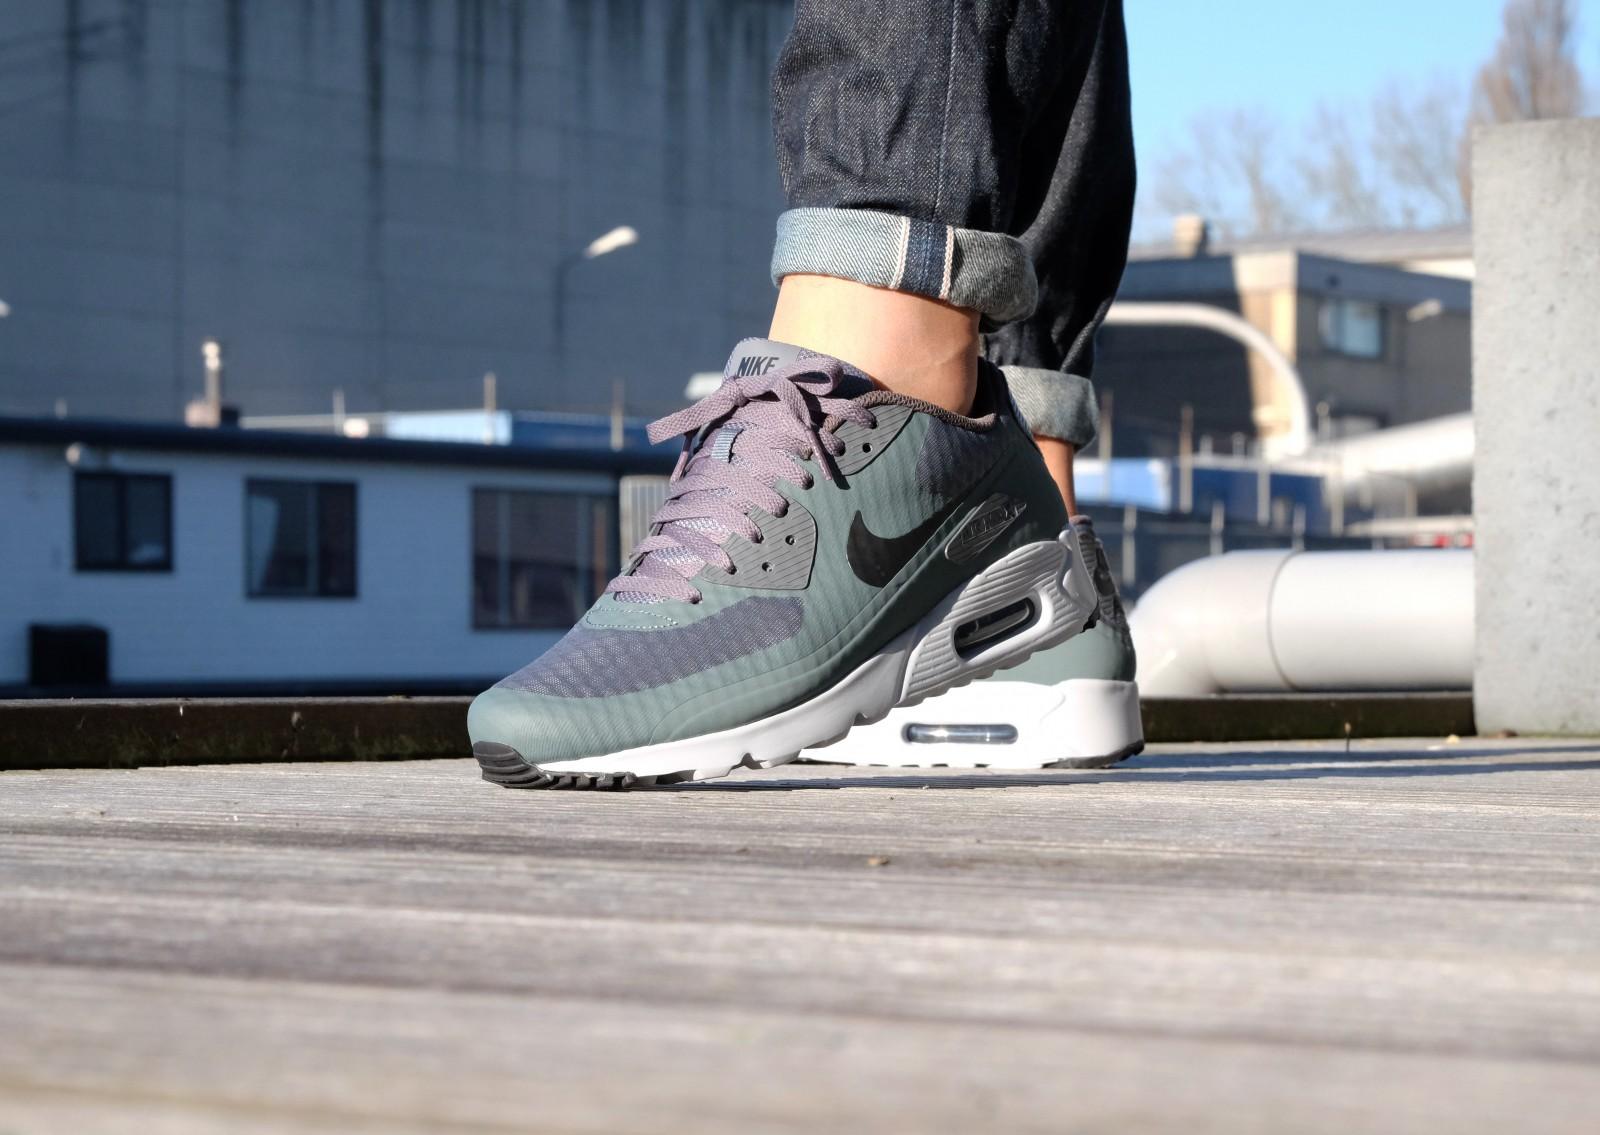 Nike Air Max 90 Ultra Essential Hasta/Black - Dark Grey - Pure Platinum